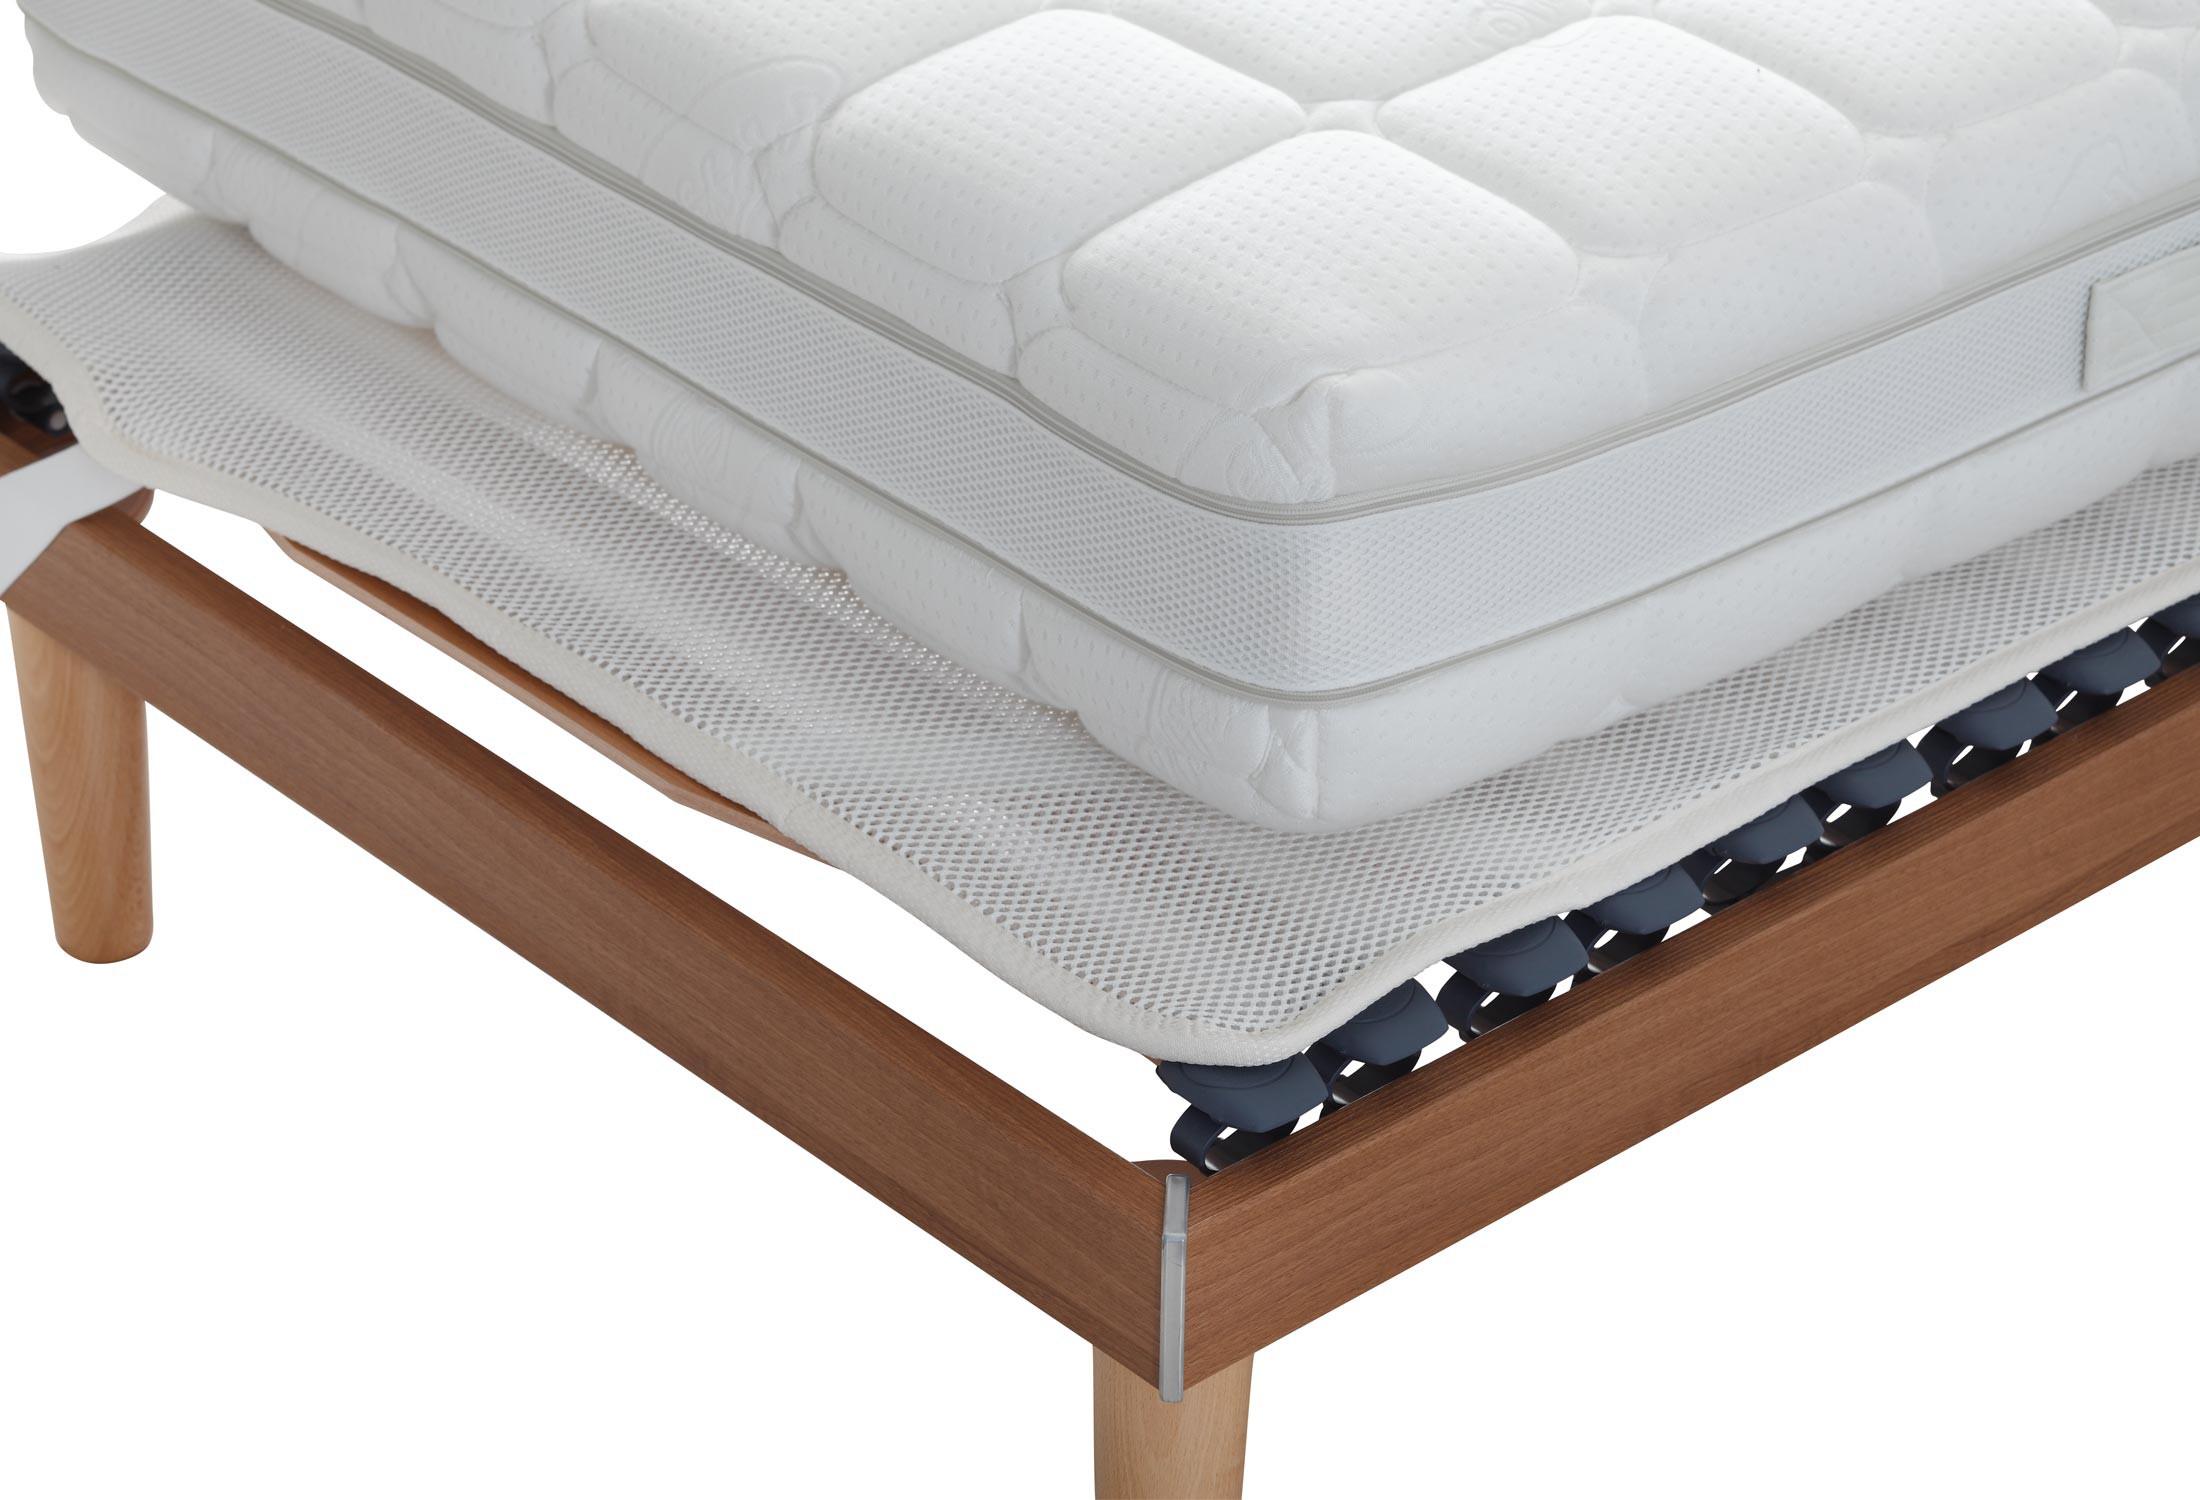 argos beds frame sofa natural double base ideas cover impressive mito futon next ikea futons day small size delivery uk